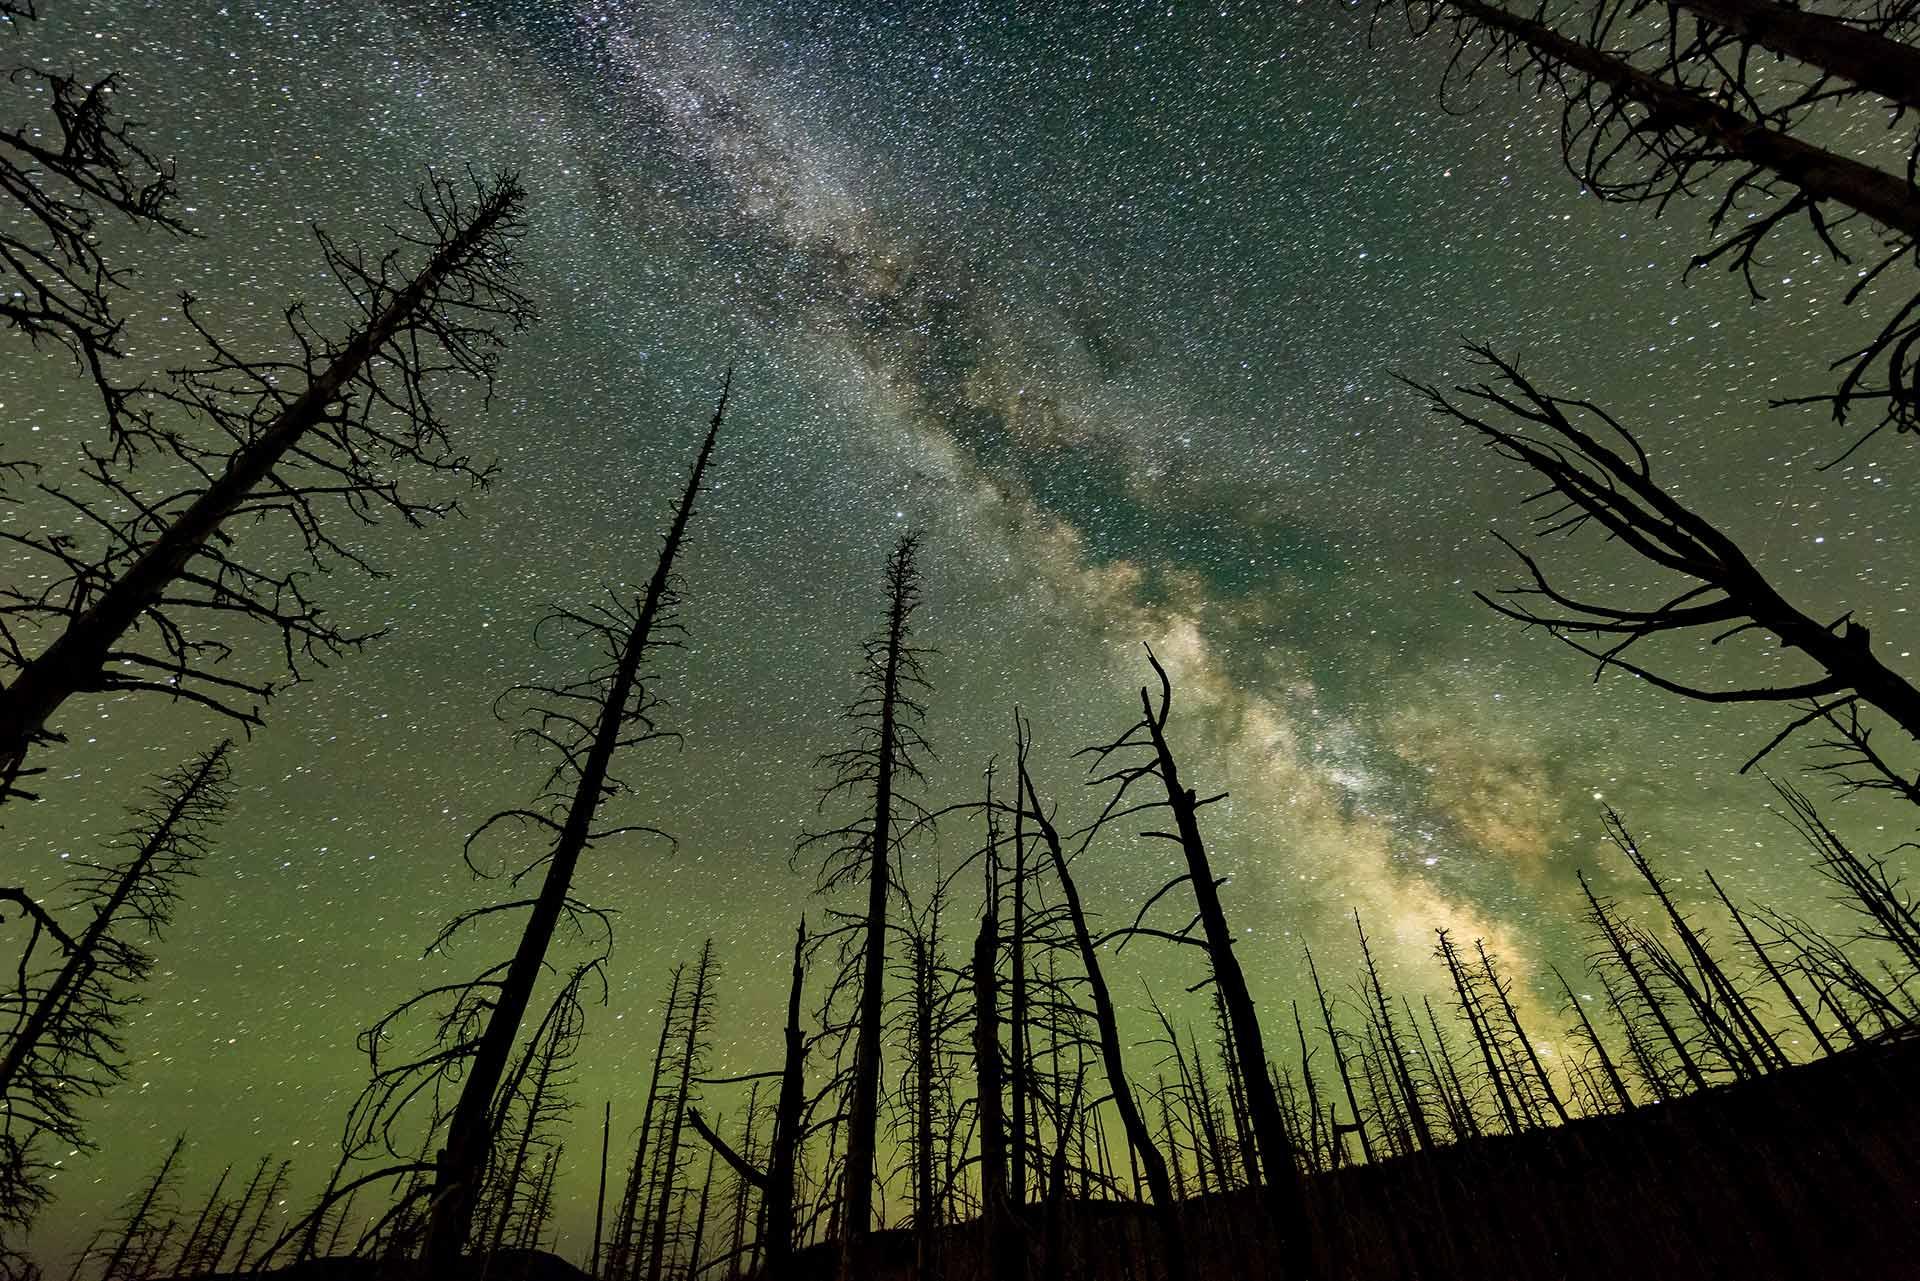 milky-way-through-trees-night-sky-photography